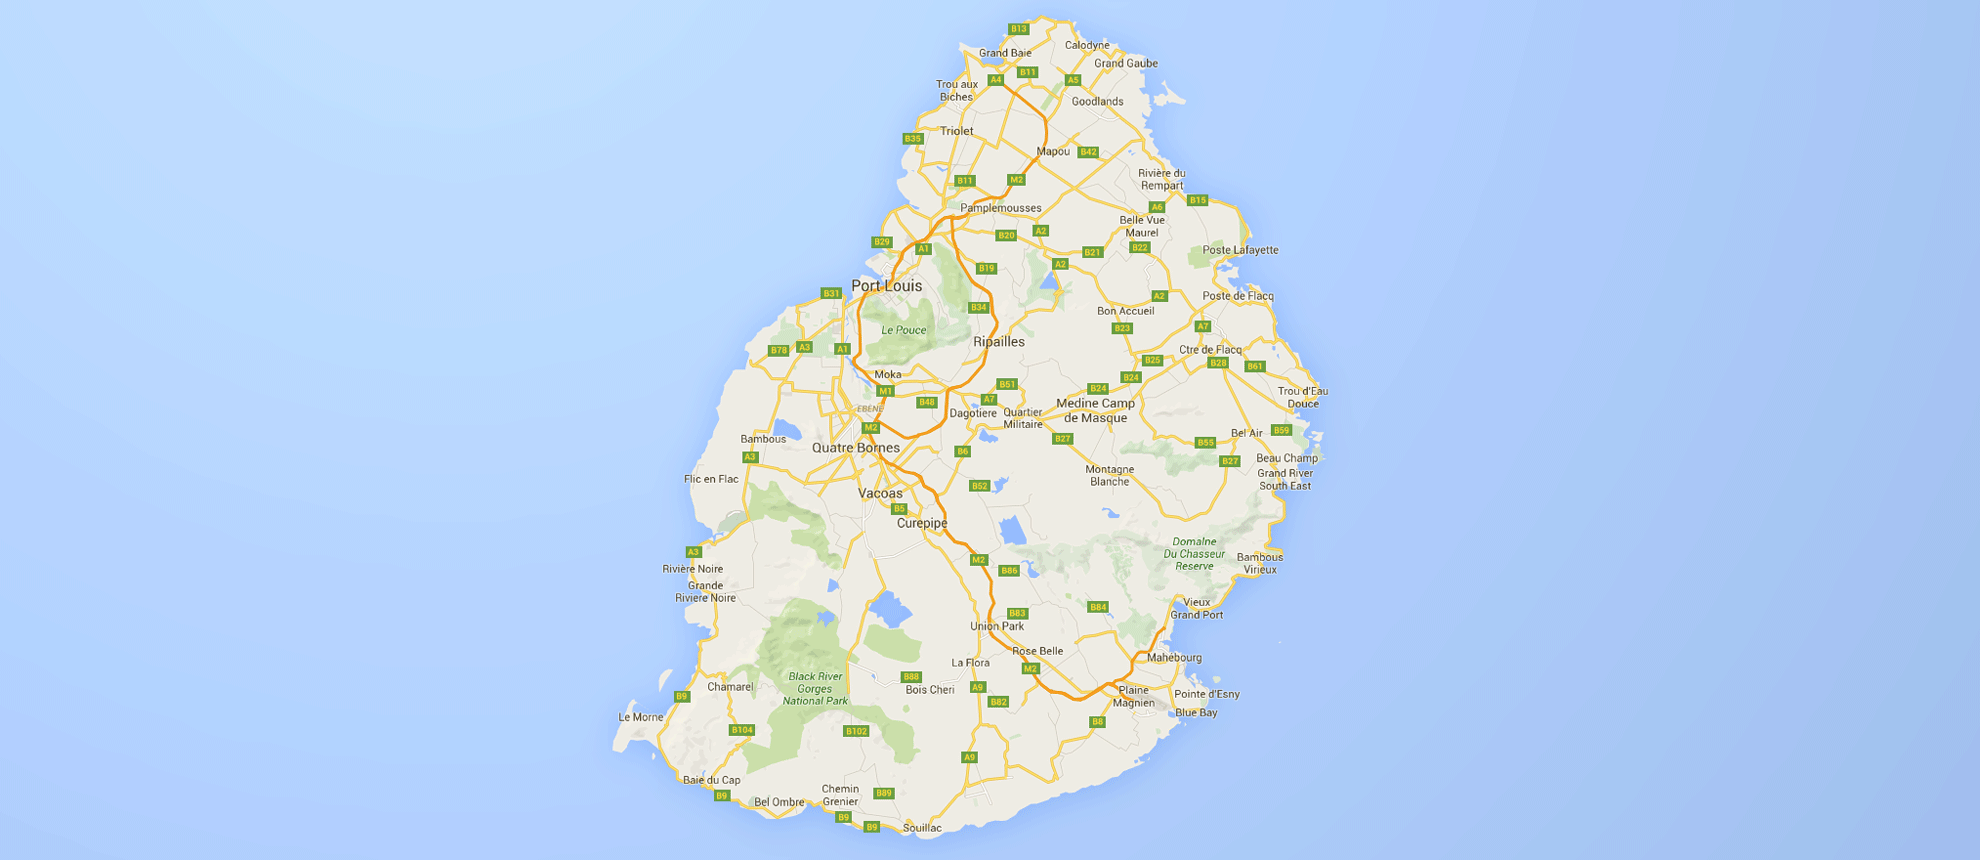 palmex ile Maurice map